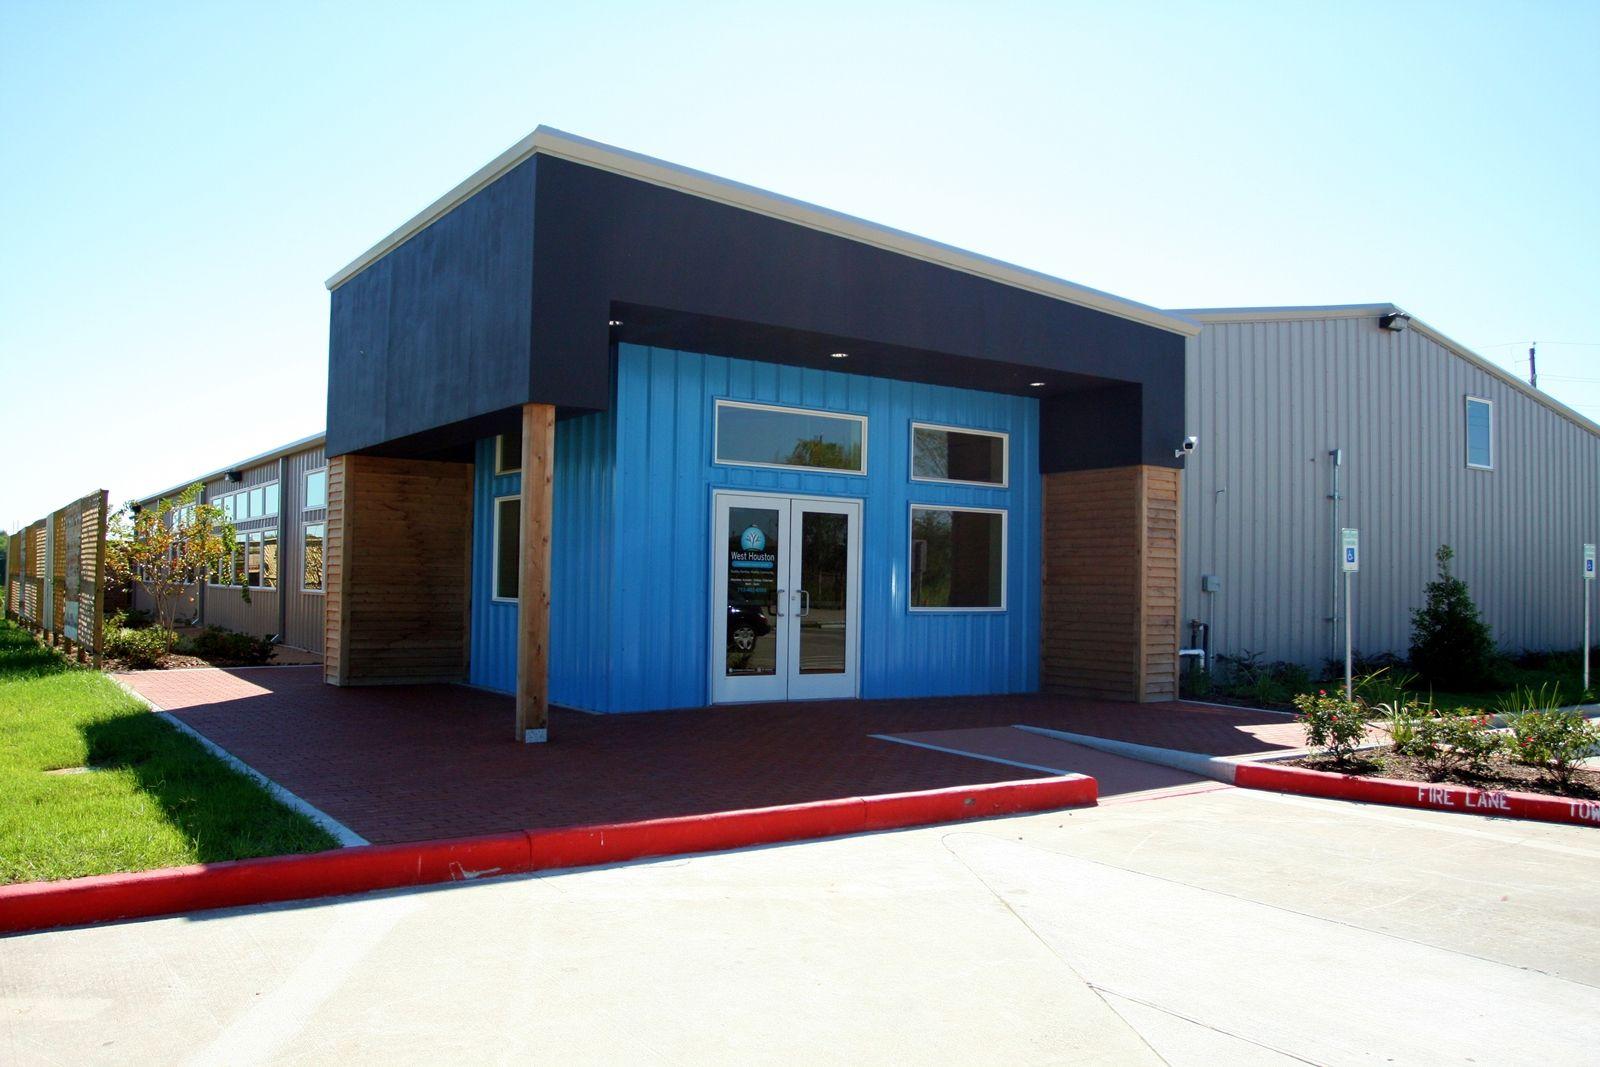 West Houston Clinic